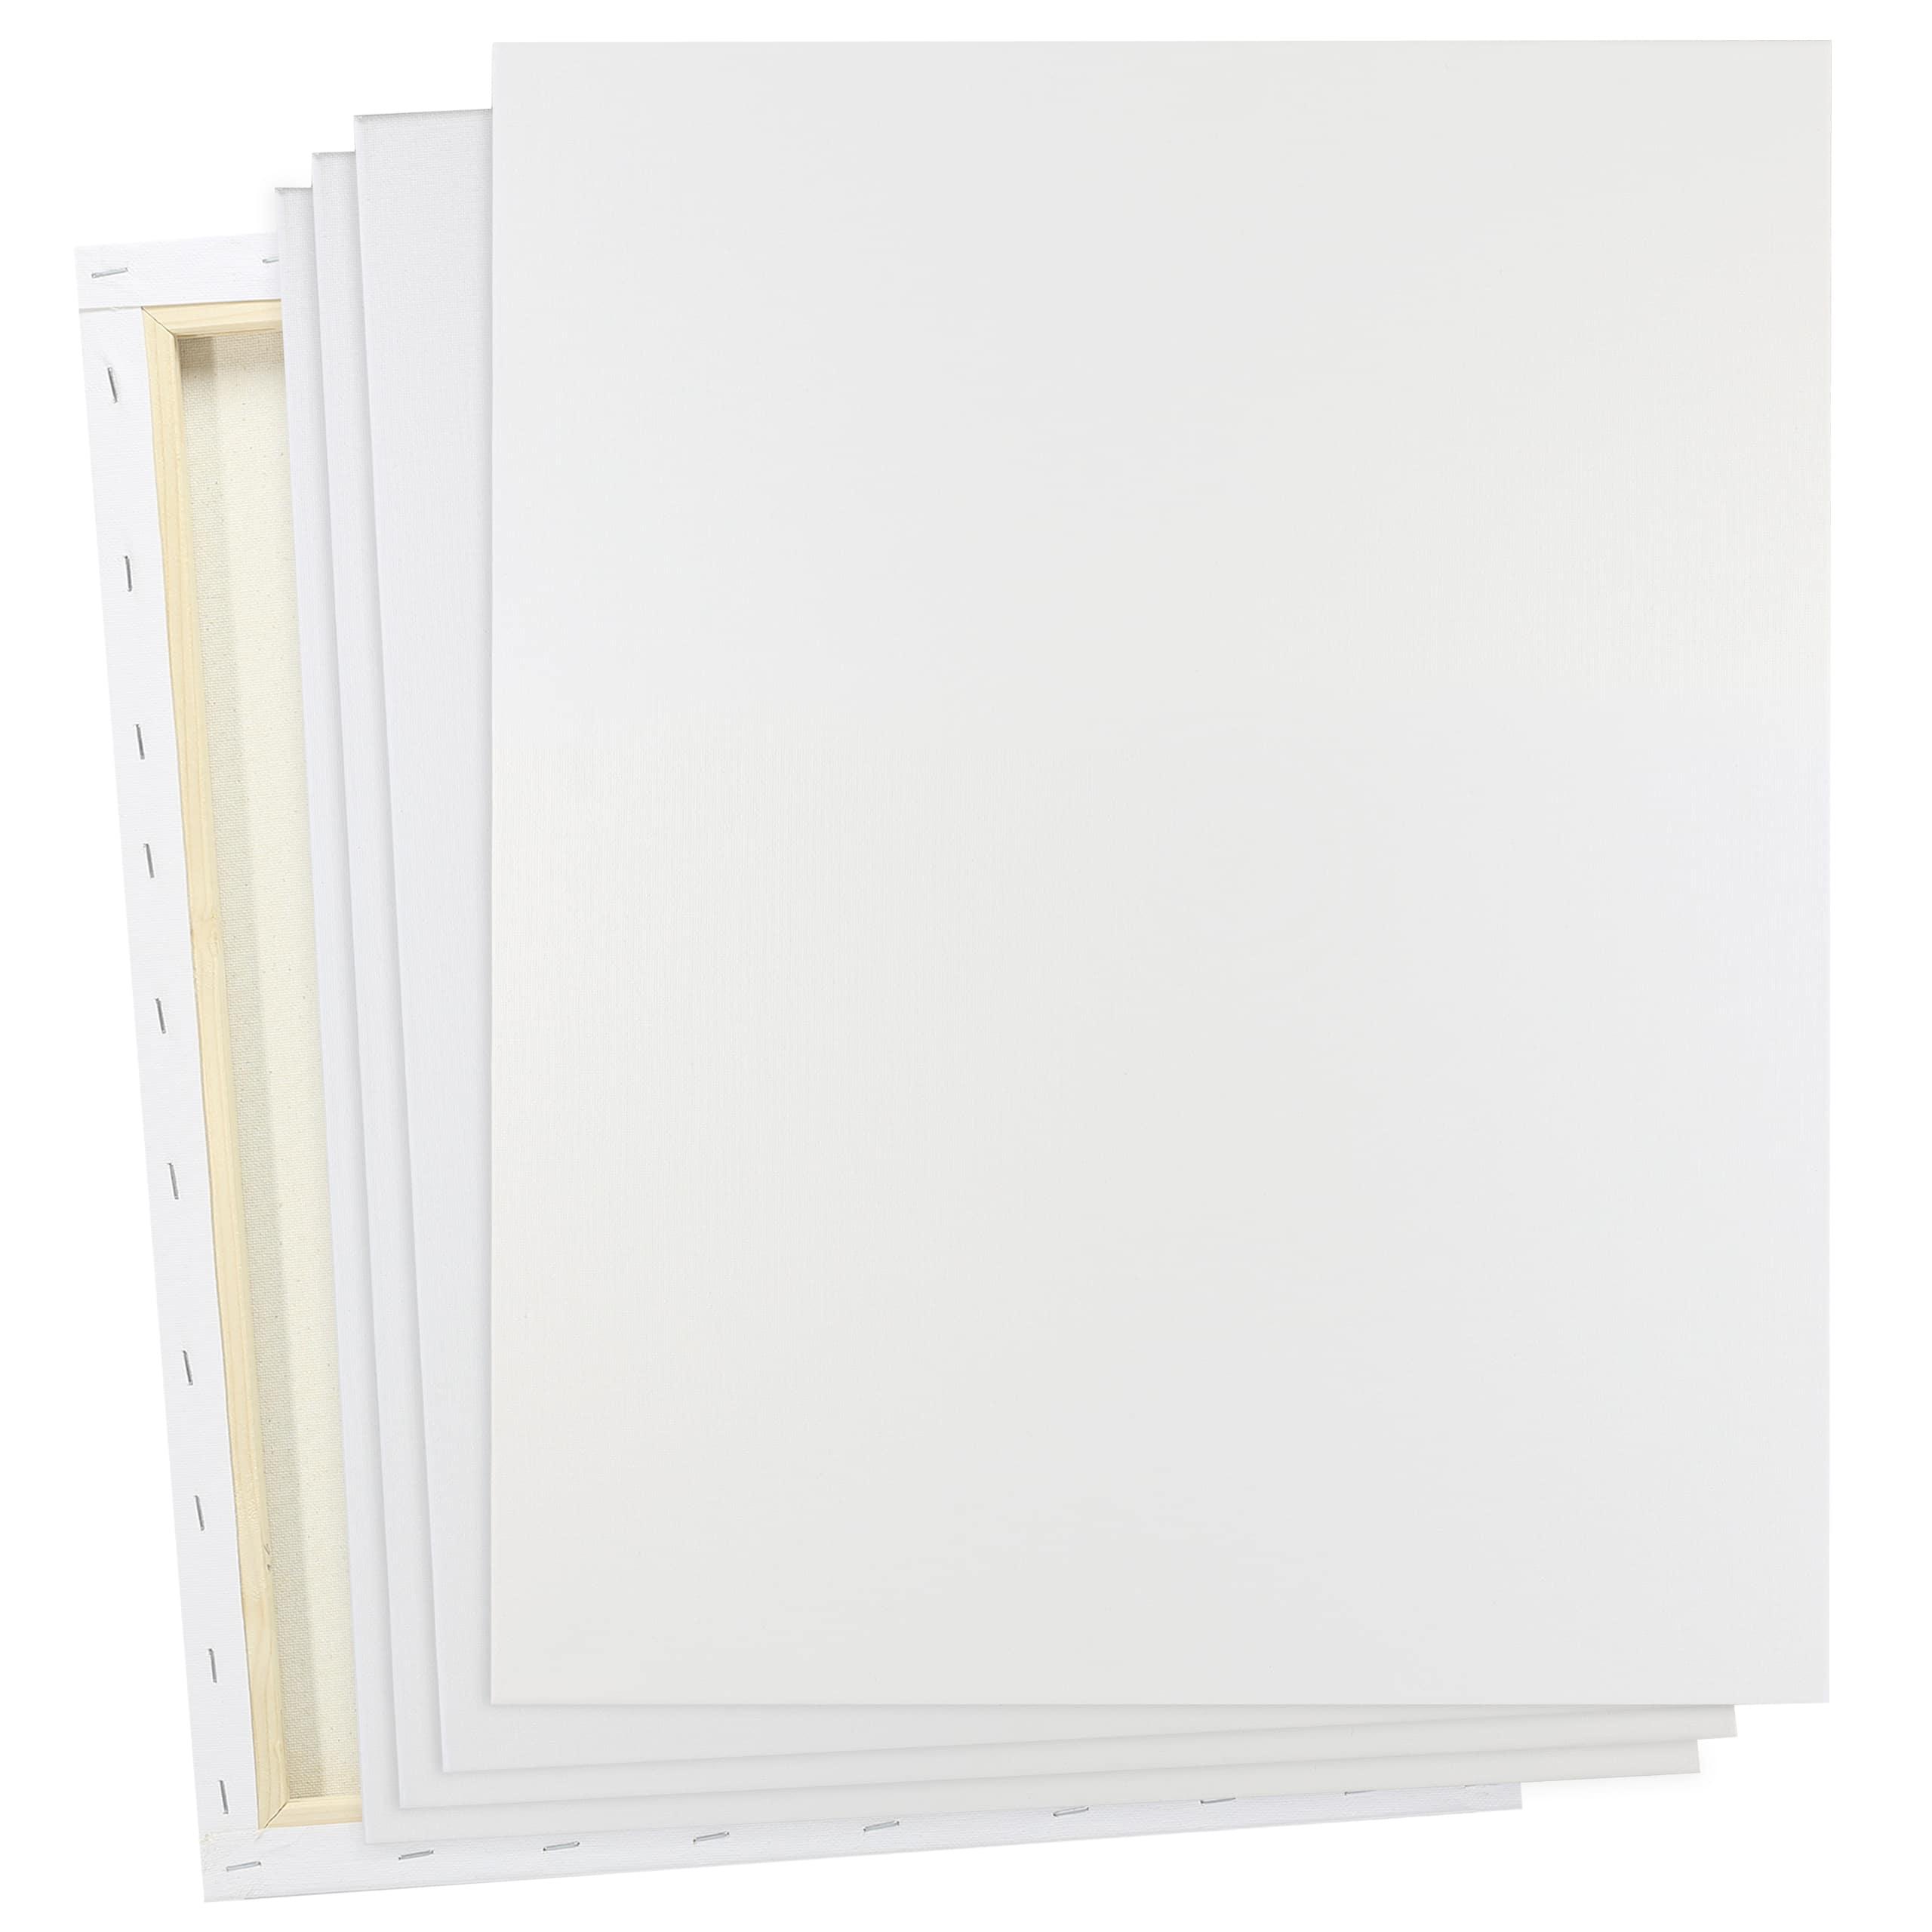 canvas packs